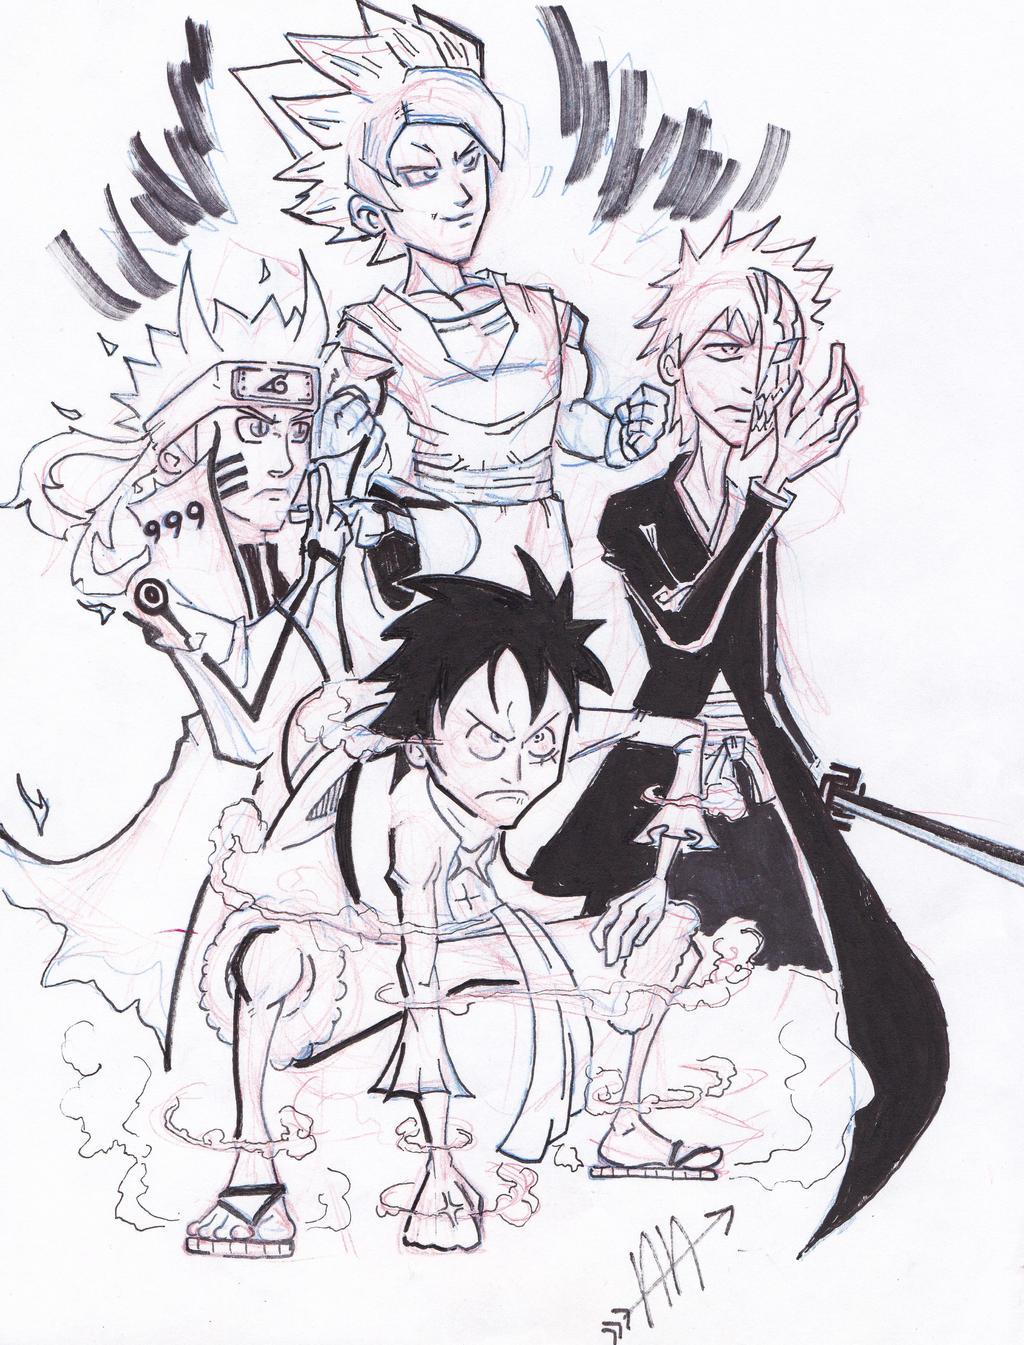 Luffy naruto goku ichigo doodle by kiddcartoony on deviantart